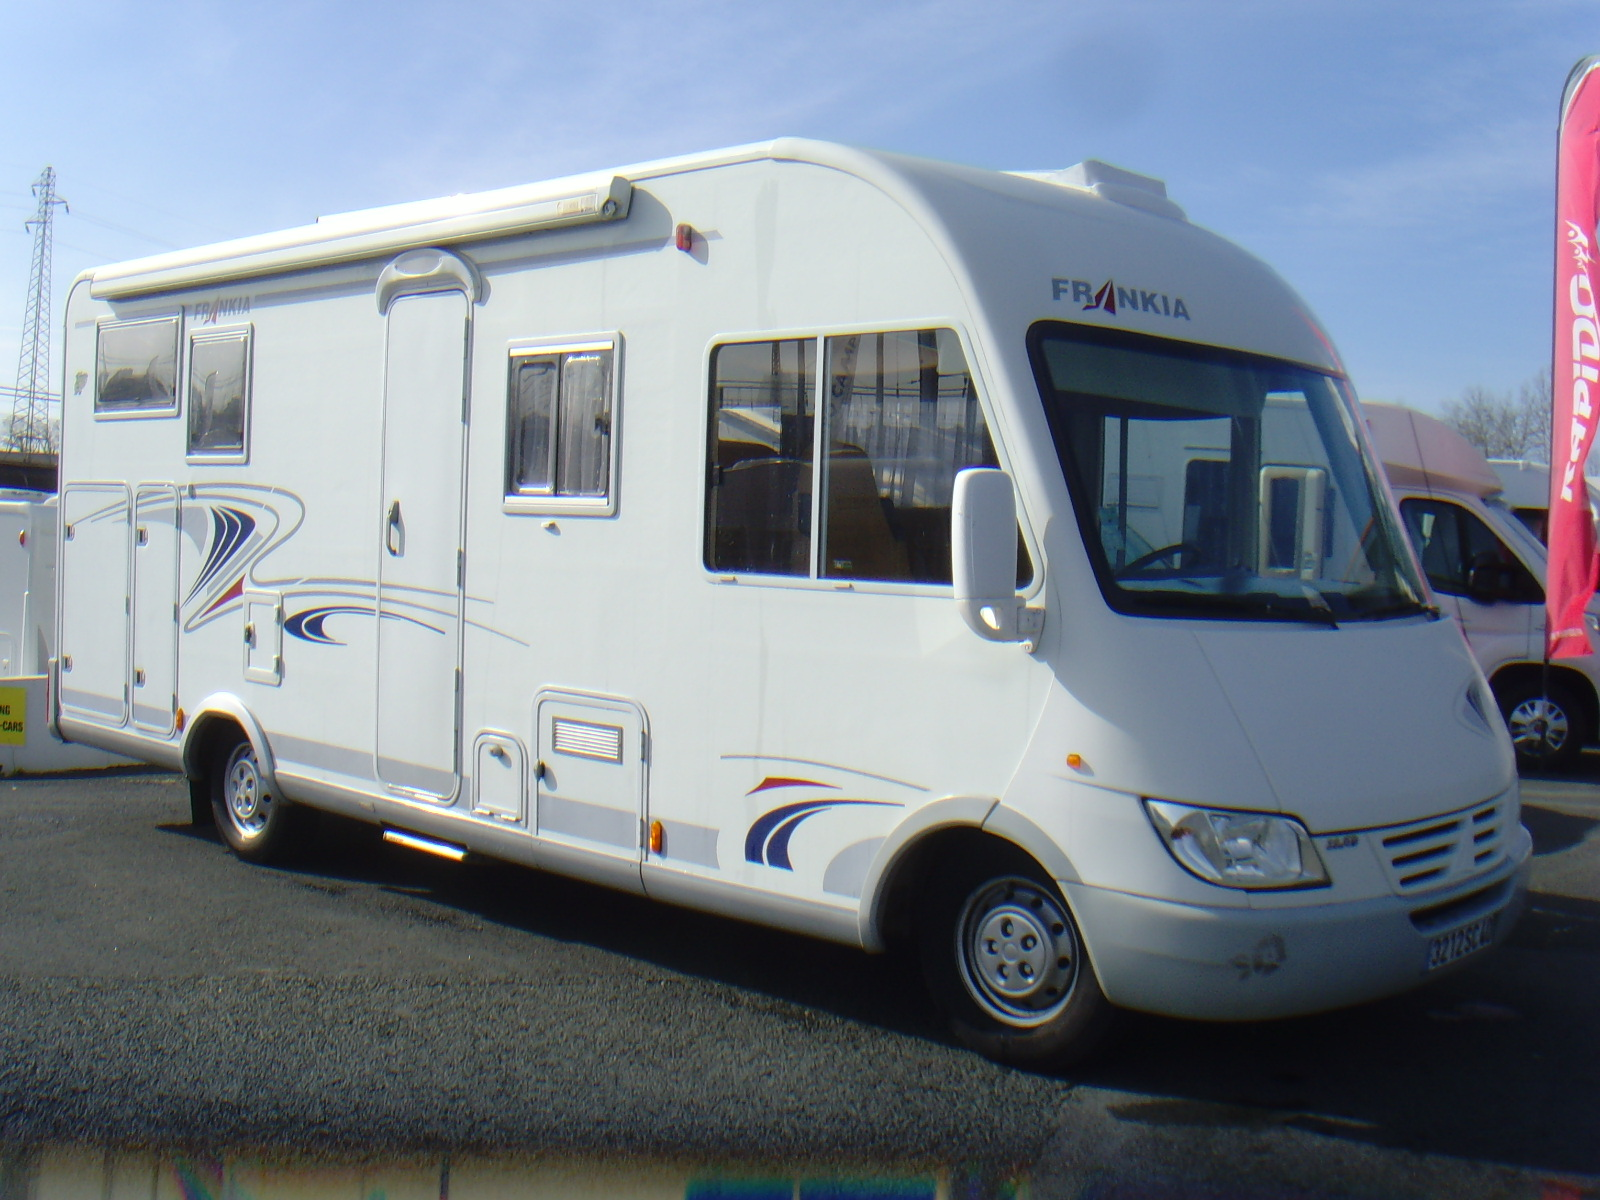 frankia i 700 bd occasion de 2002 fiat camping car en vente bayonne pyrenees atlantiques. Black Bedroom Furniture Sets. Home Design Ideas